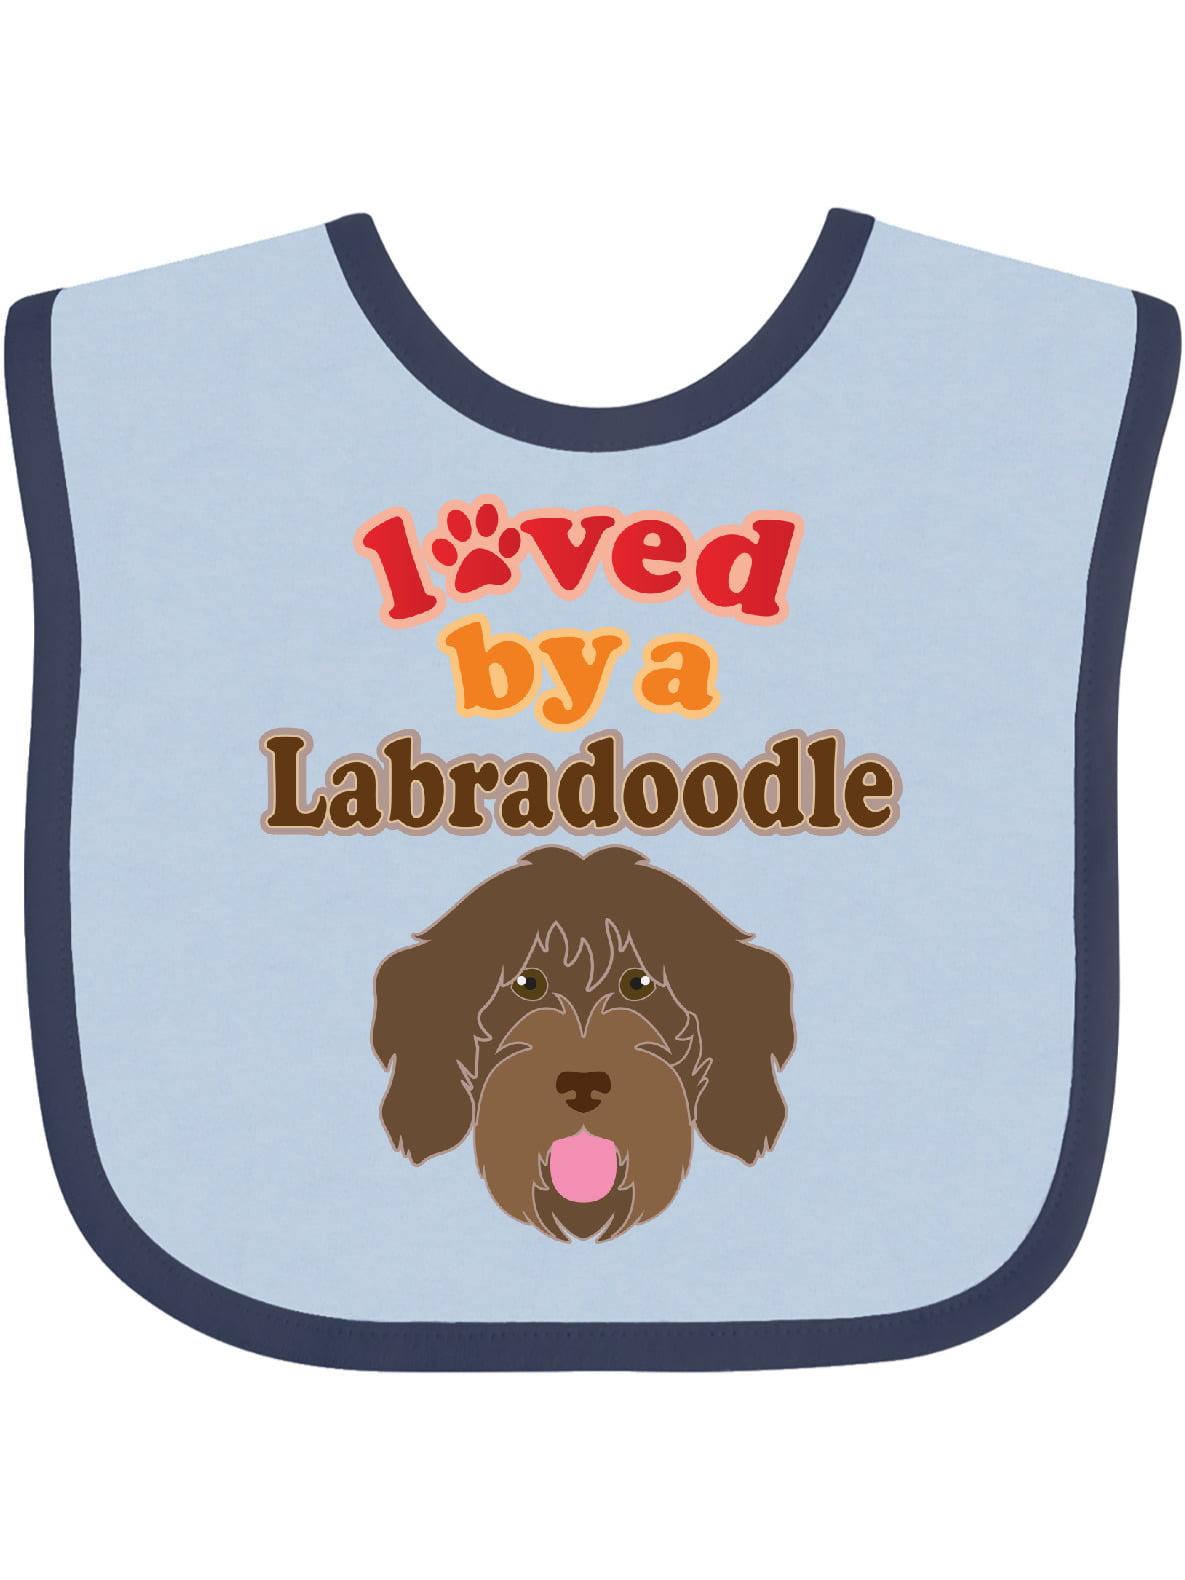 Labradoodle Dog Lover Baby Bib